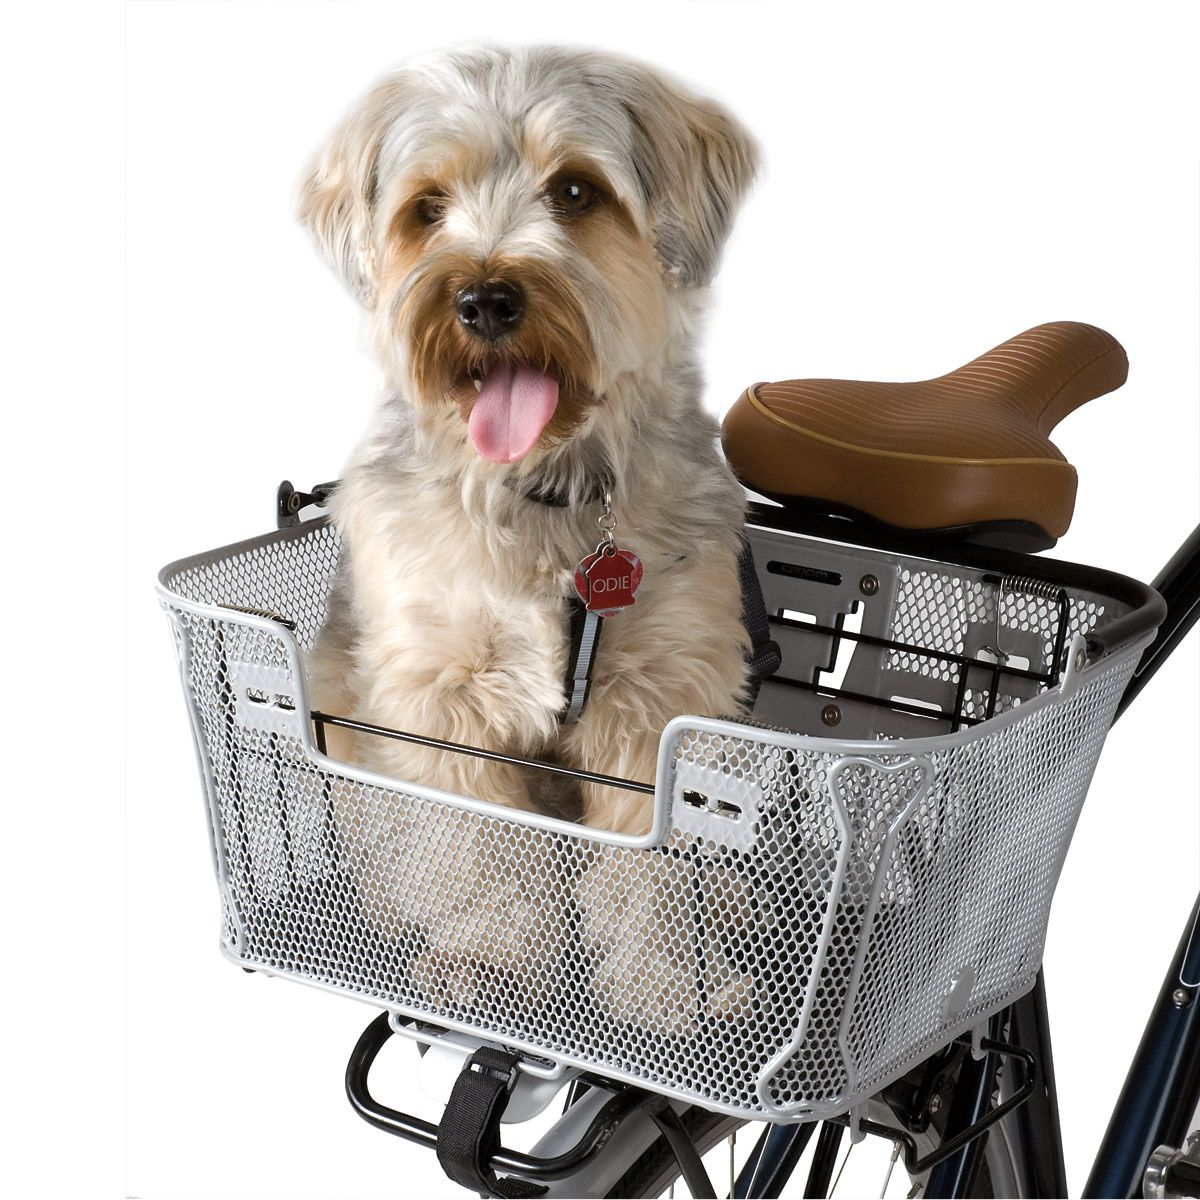 Axiom dog #bicycle dog basked $75 . Jump guard included.